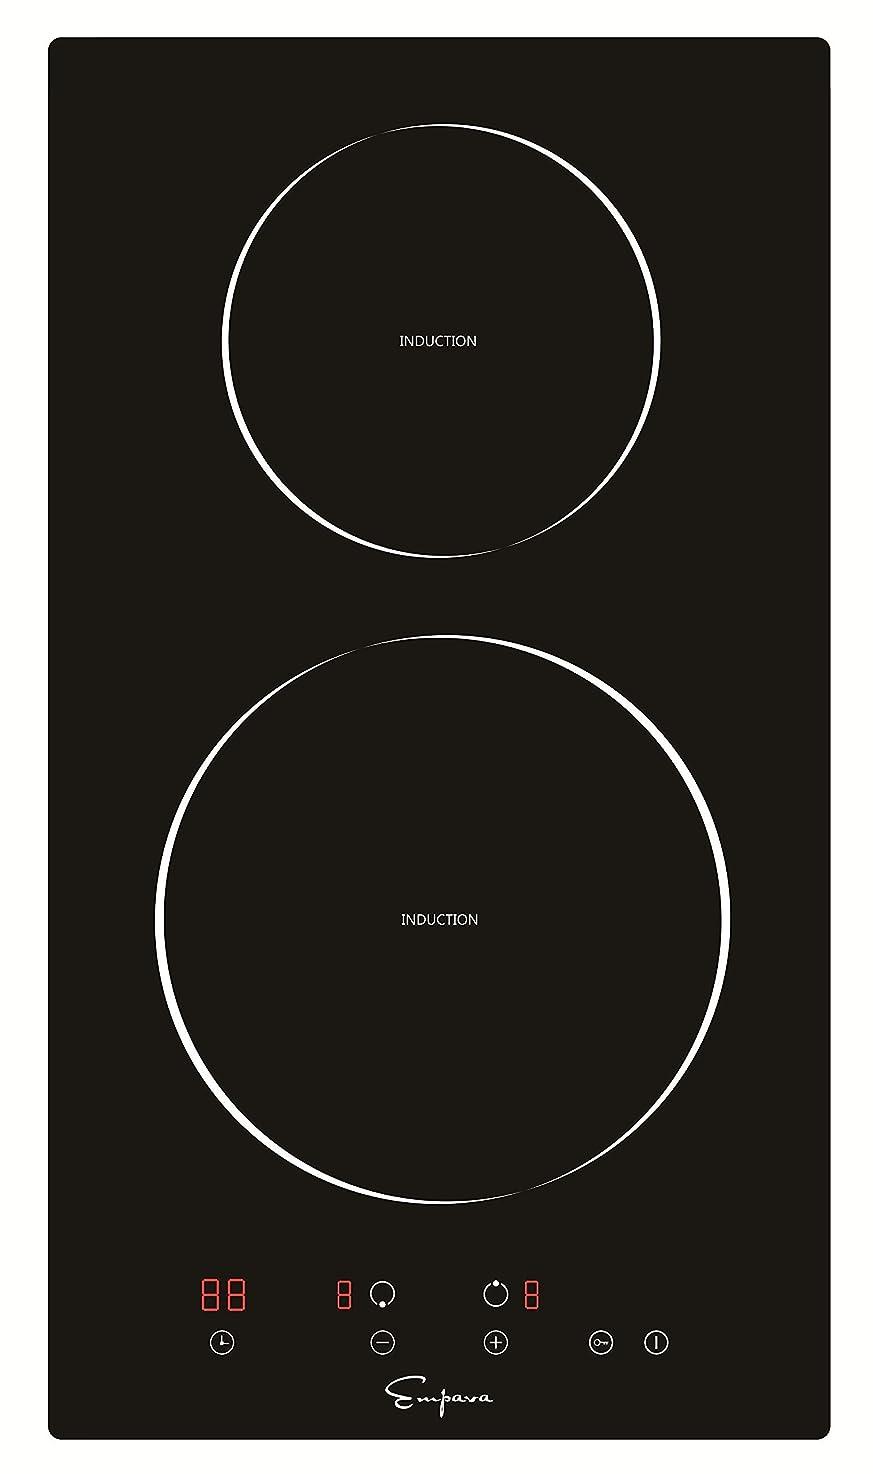 "Empava EMPV-IDC12 12"" Induction Cooktop Electric Stove Black Vitro Ceramic Smooth Surface Glass 3000 Watts vwcszeymgddxs0"